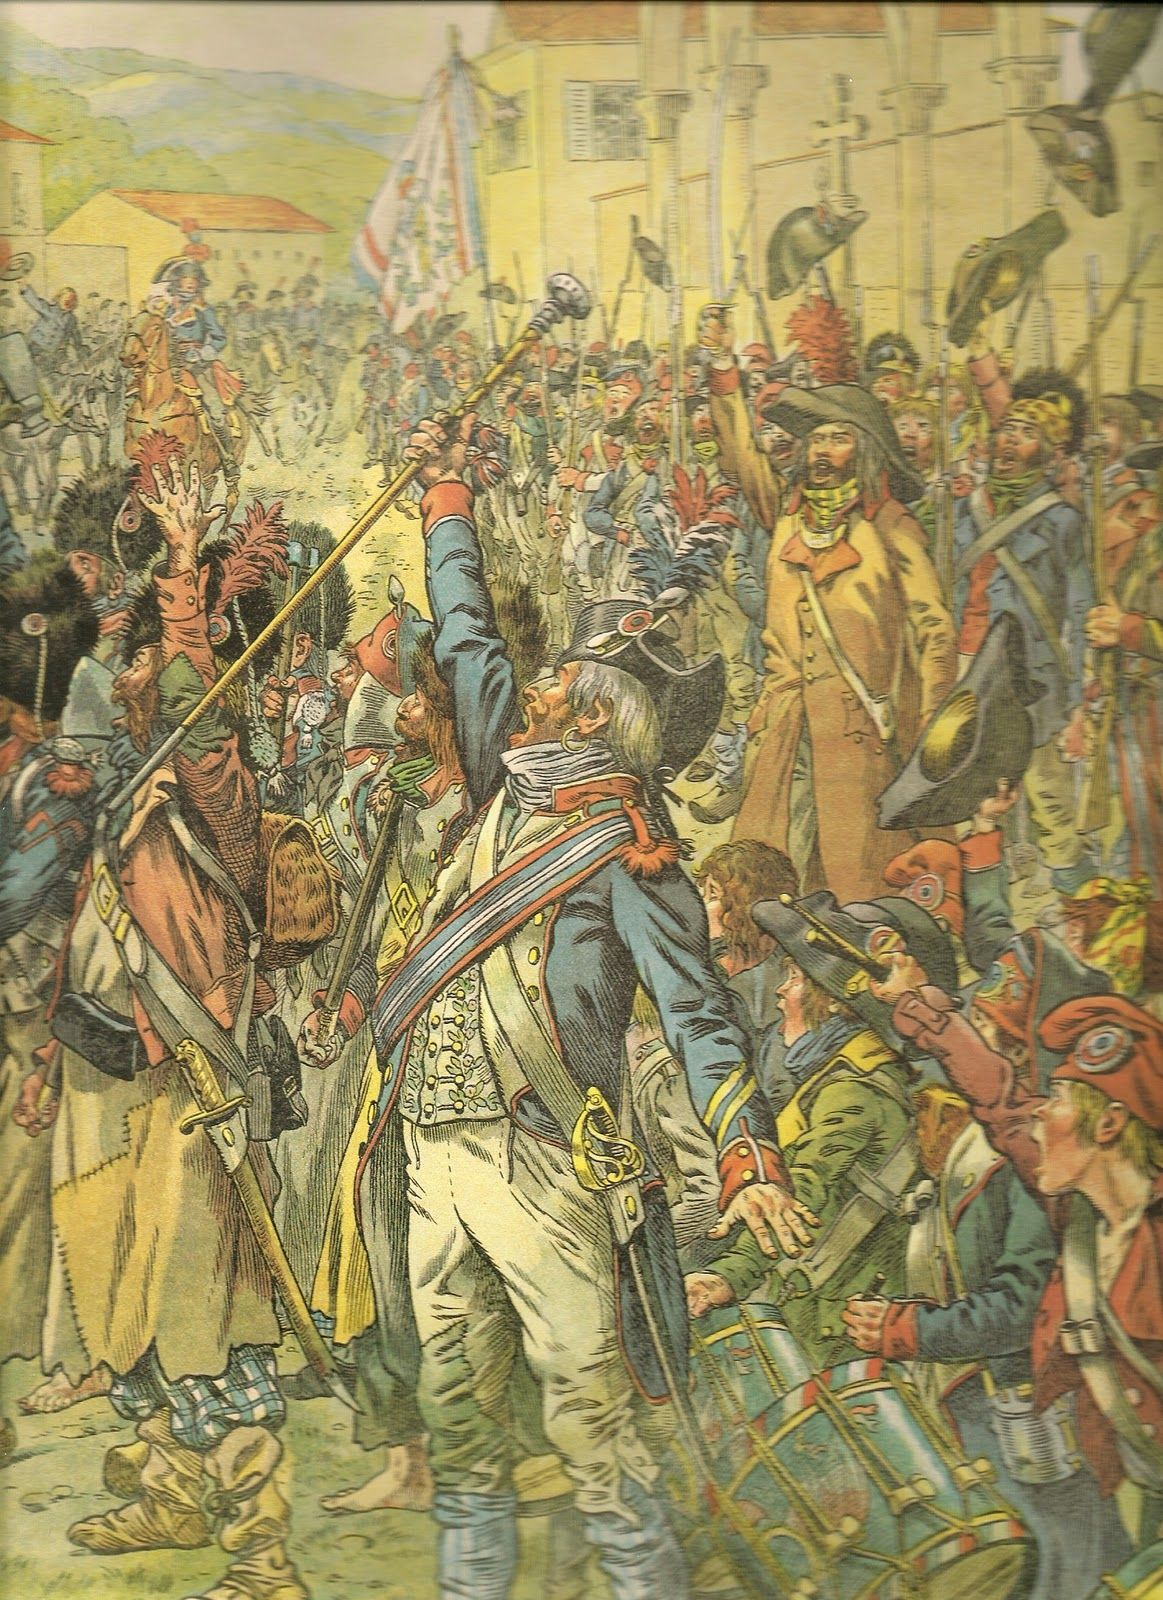 Victory celebrations - Italian Campaign 1800